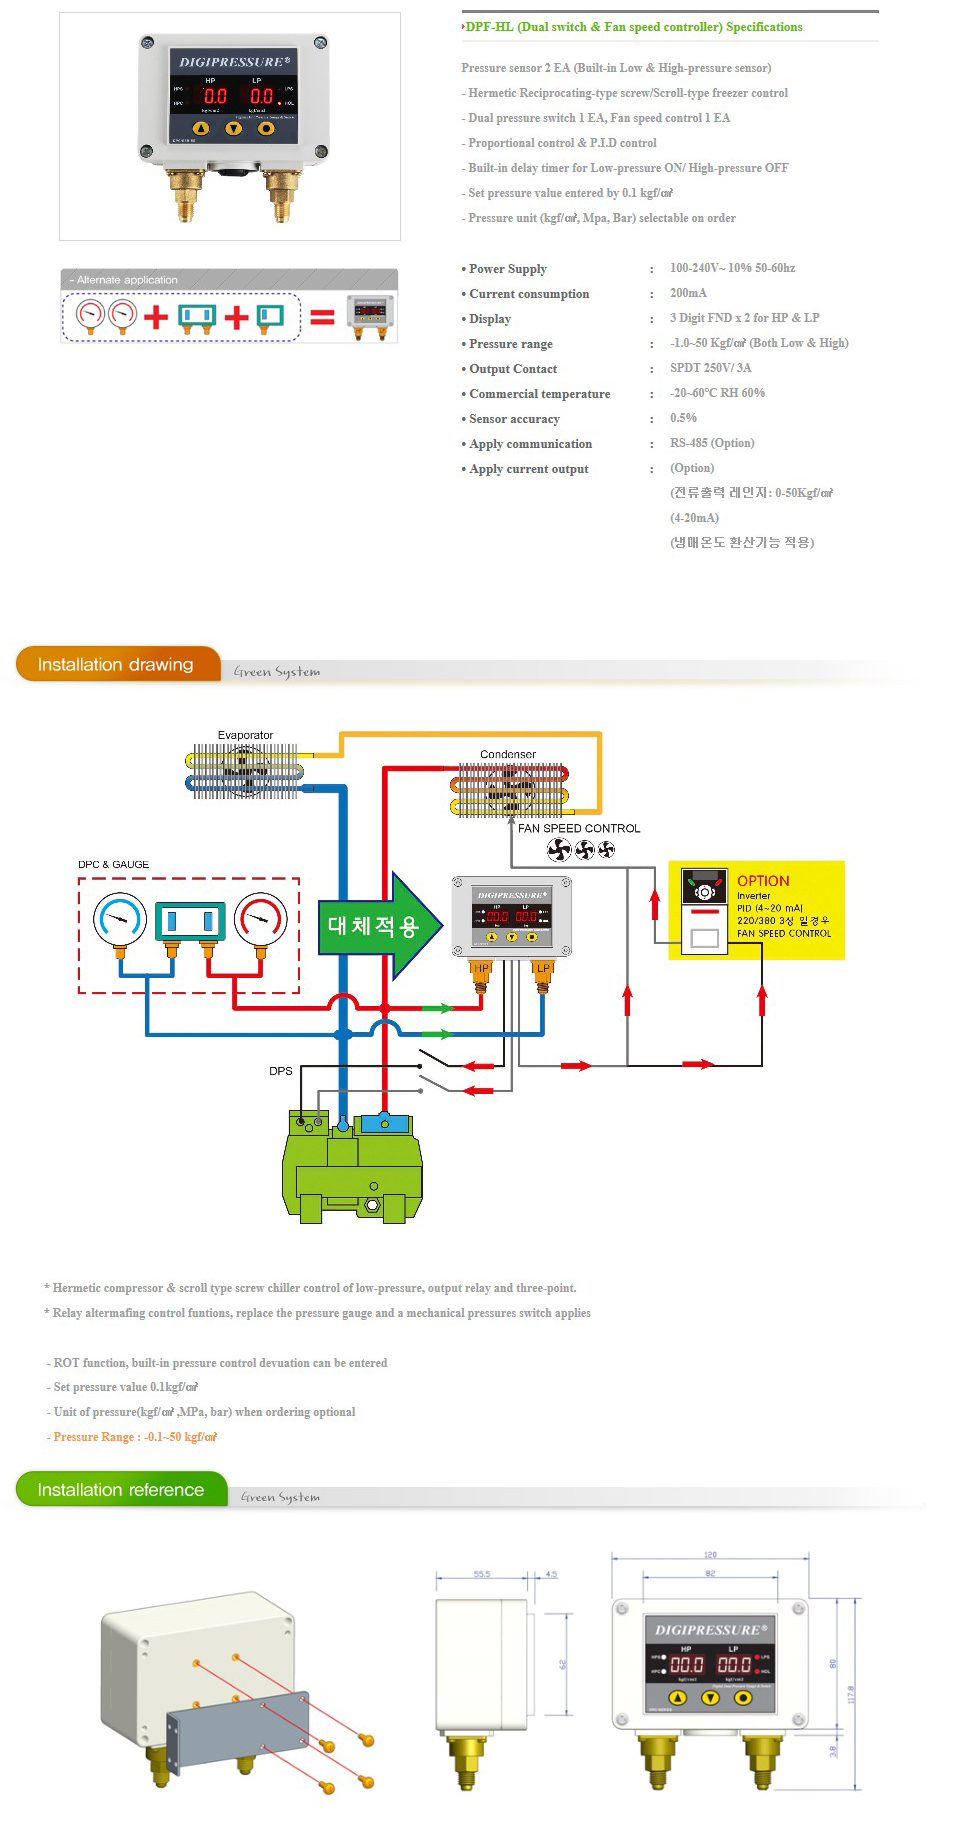 GREEN SYSTEM Dual switch & Fan speed controller DPF-HL